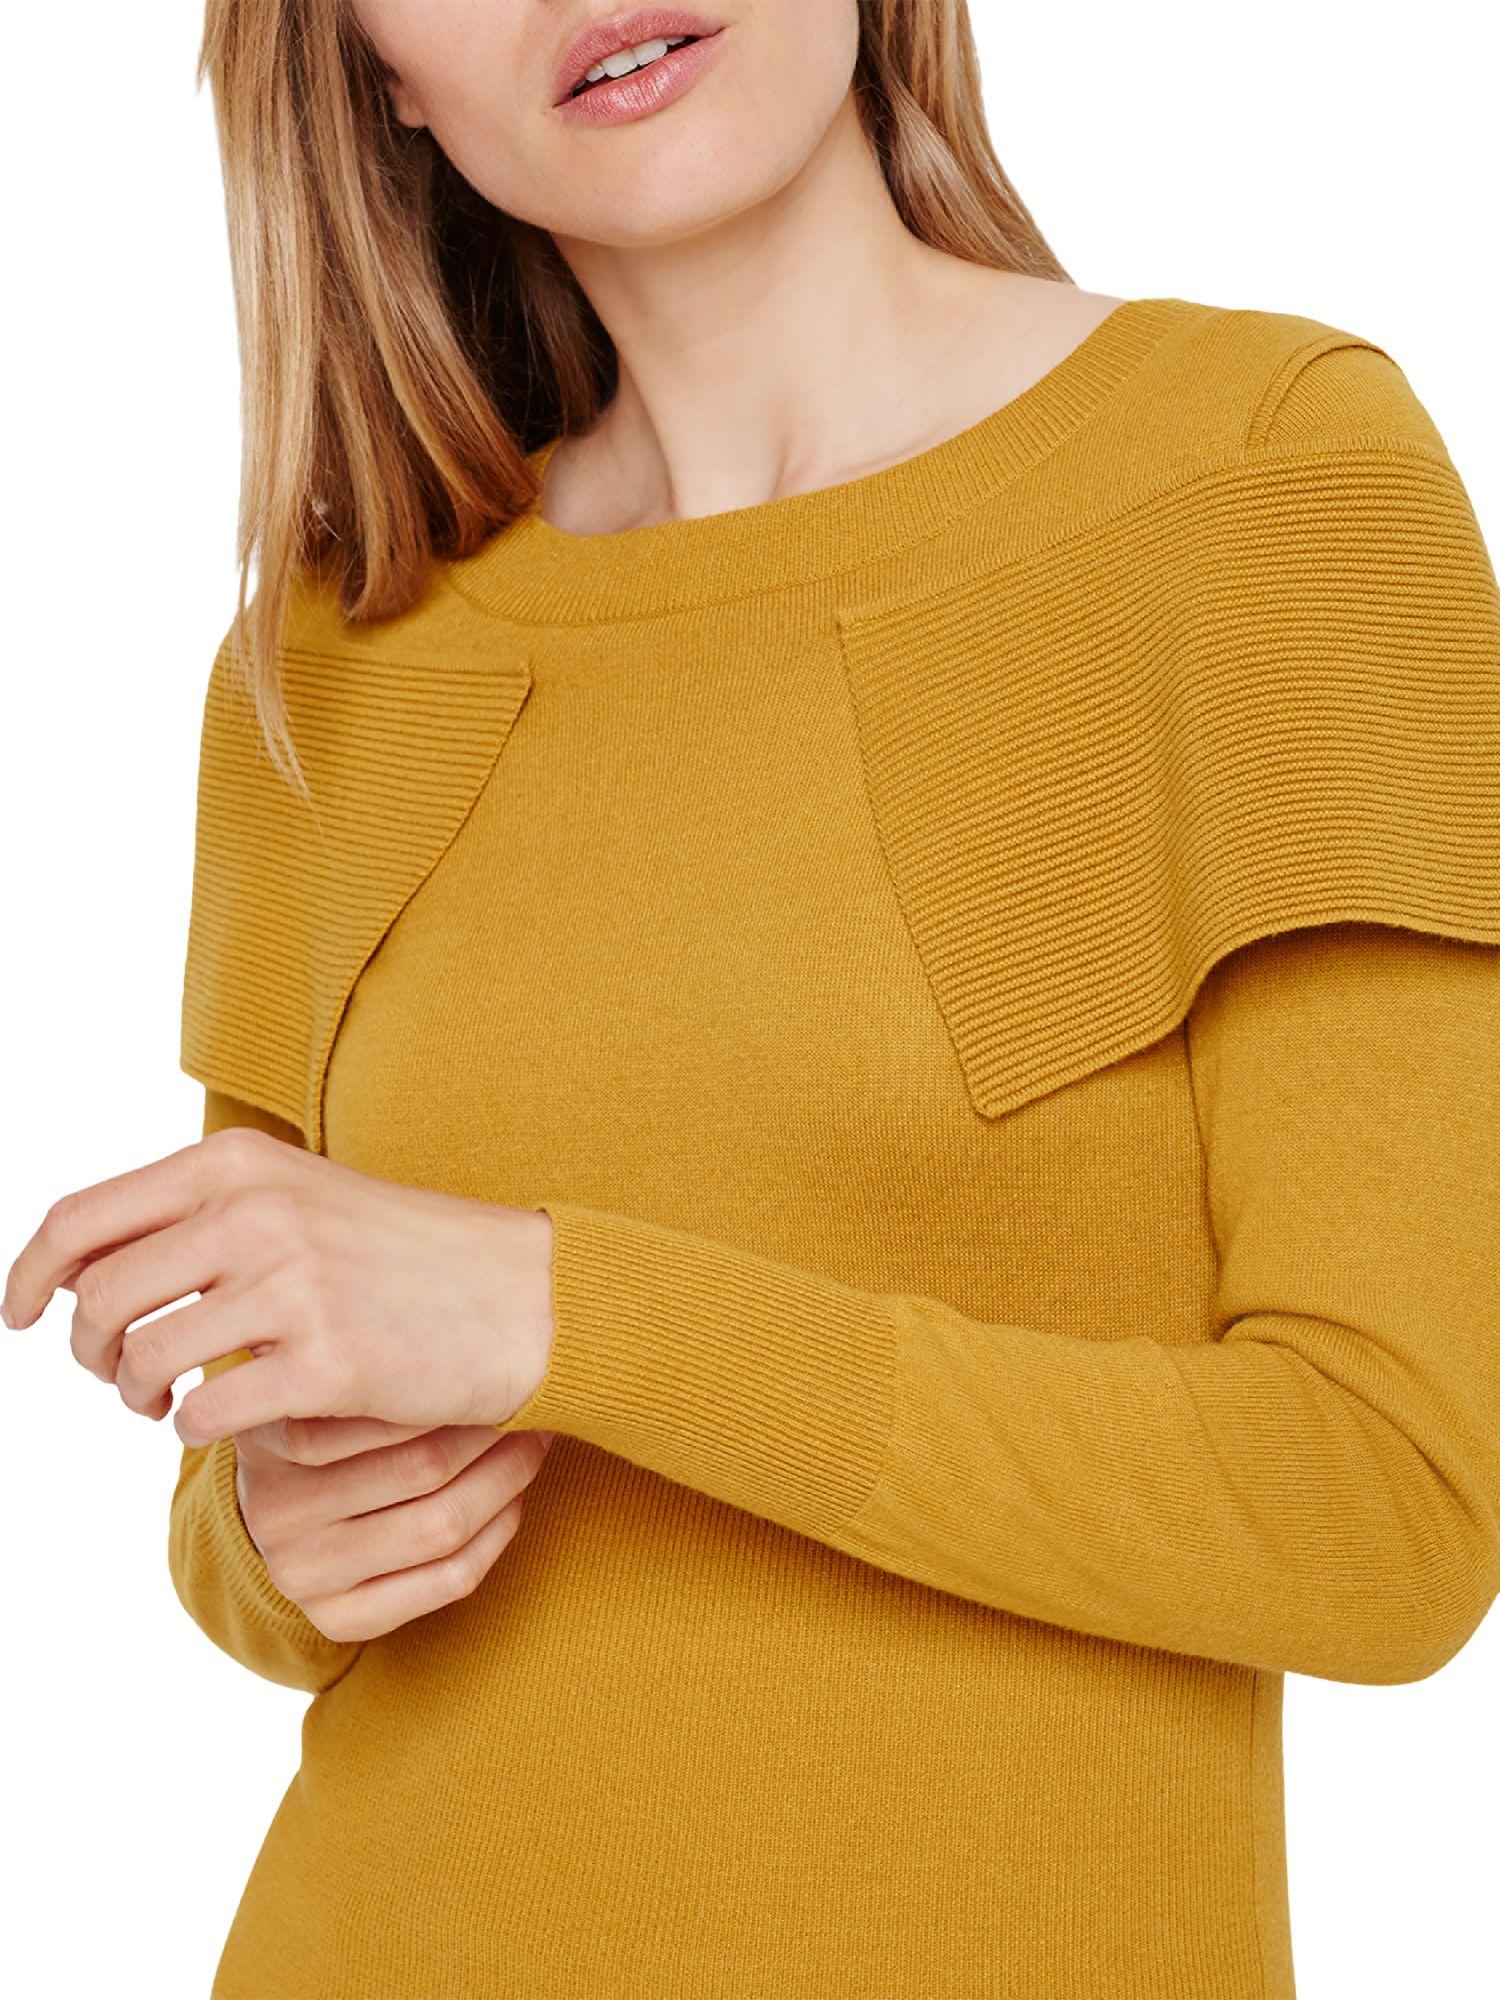 Damsel in a dress Damsel in a Dress Over Knitted Jumper, Mustard